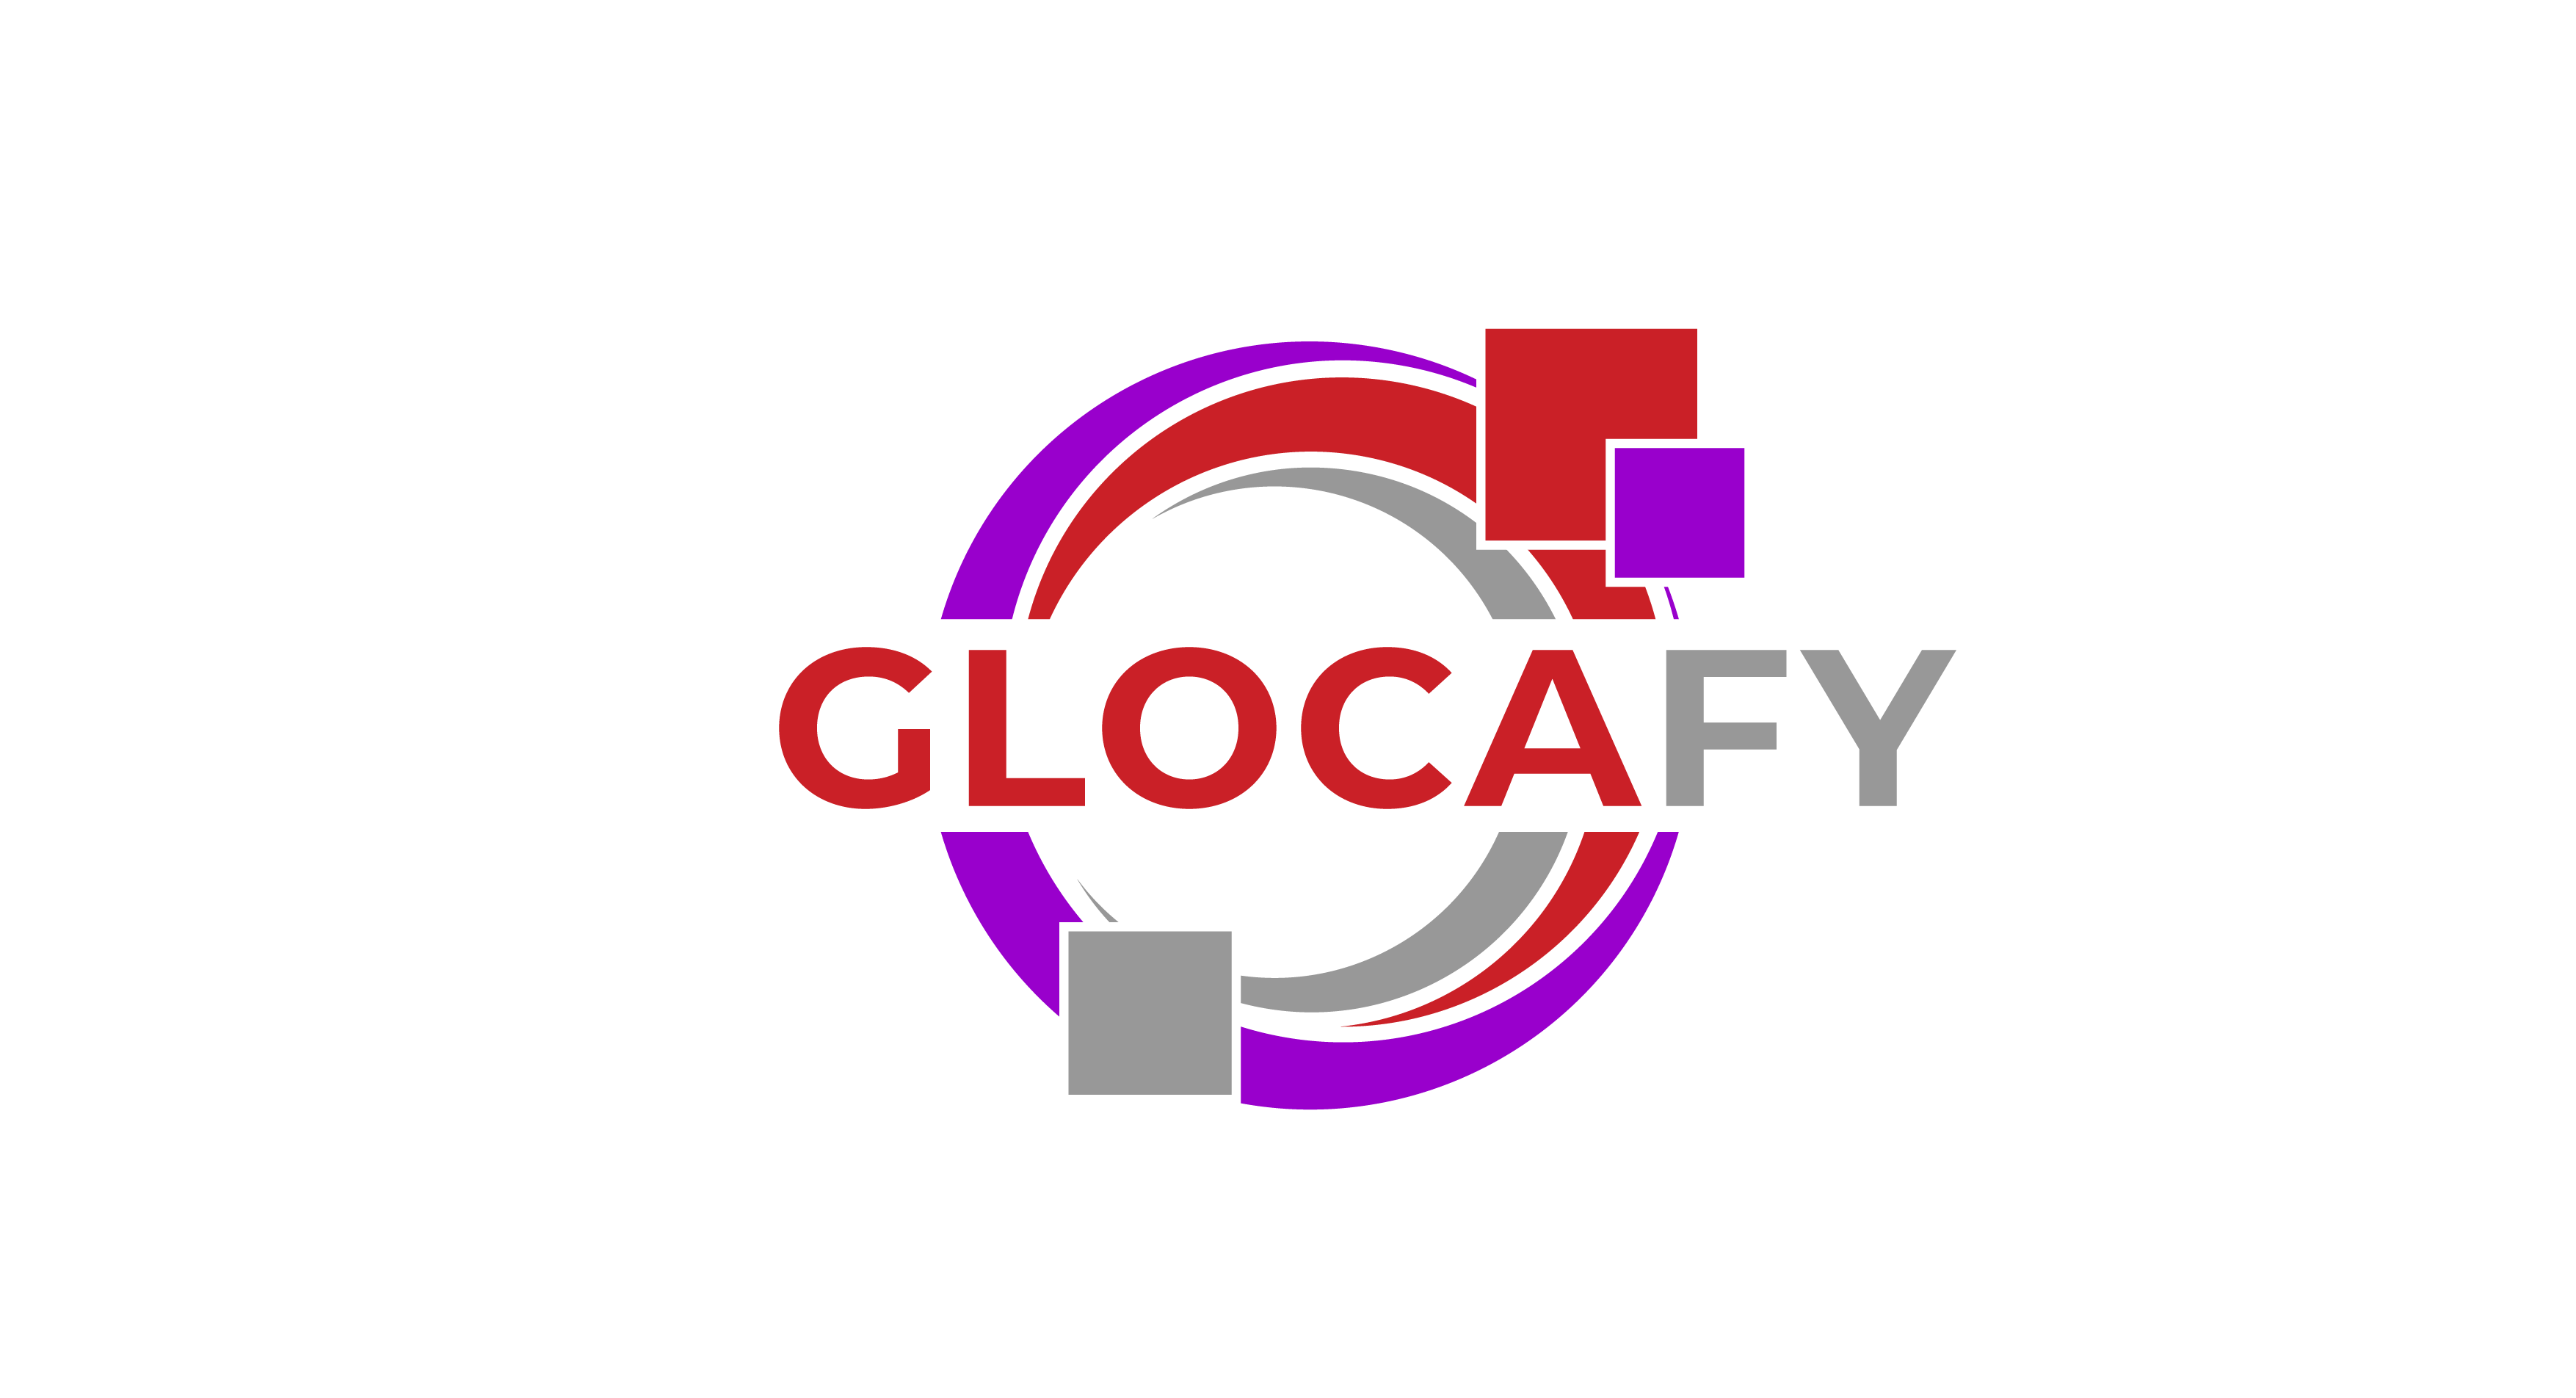 Glocafy